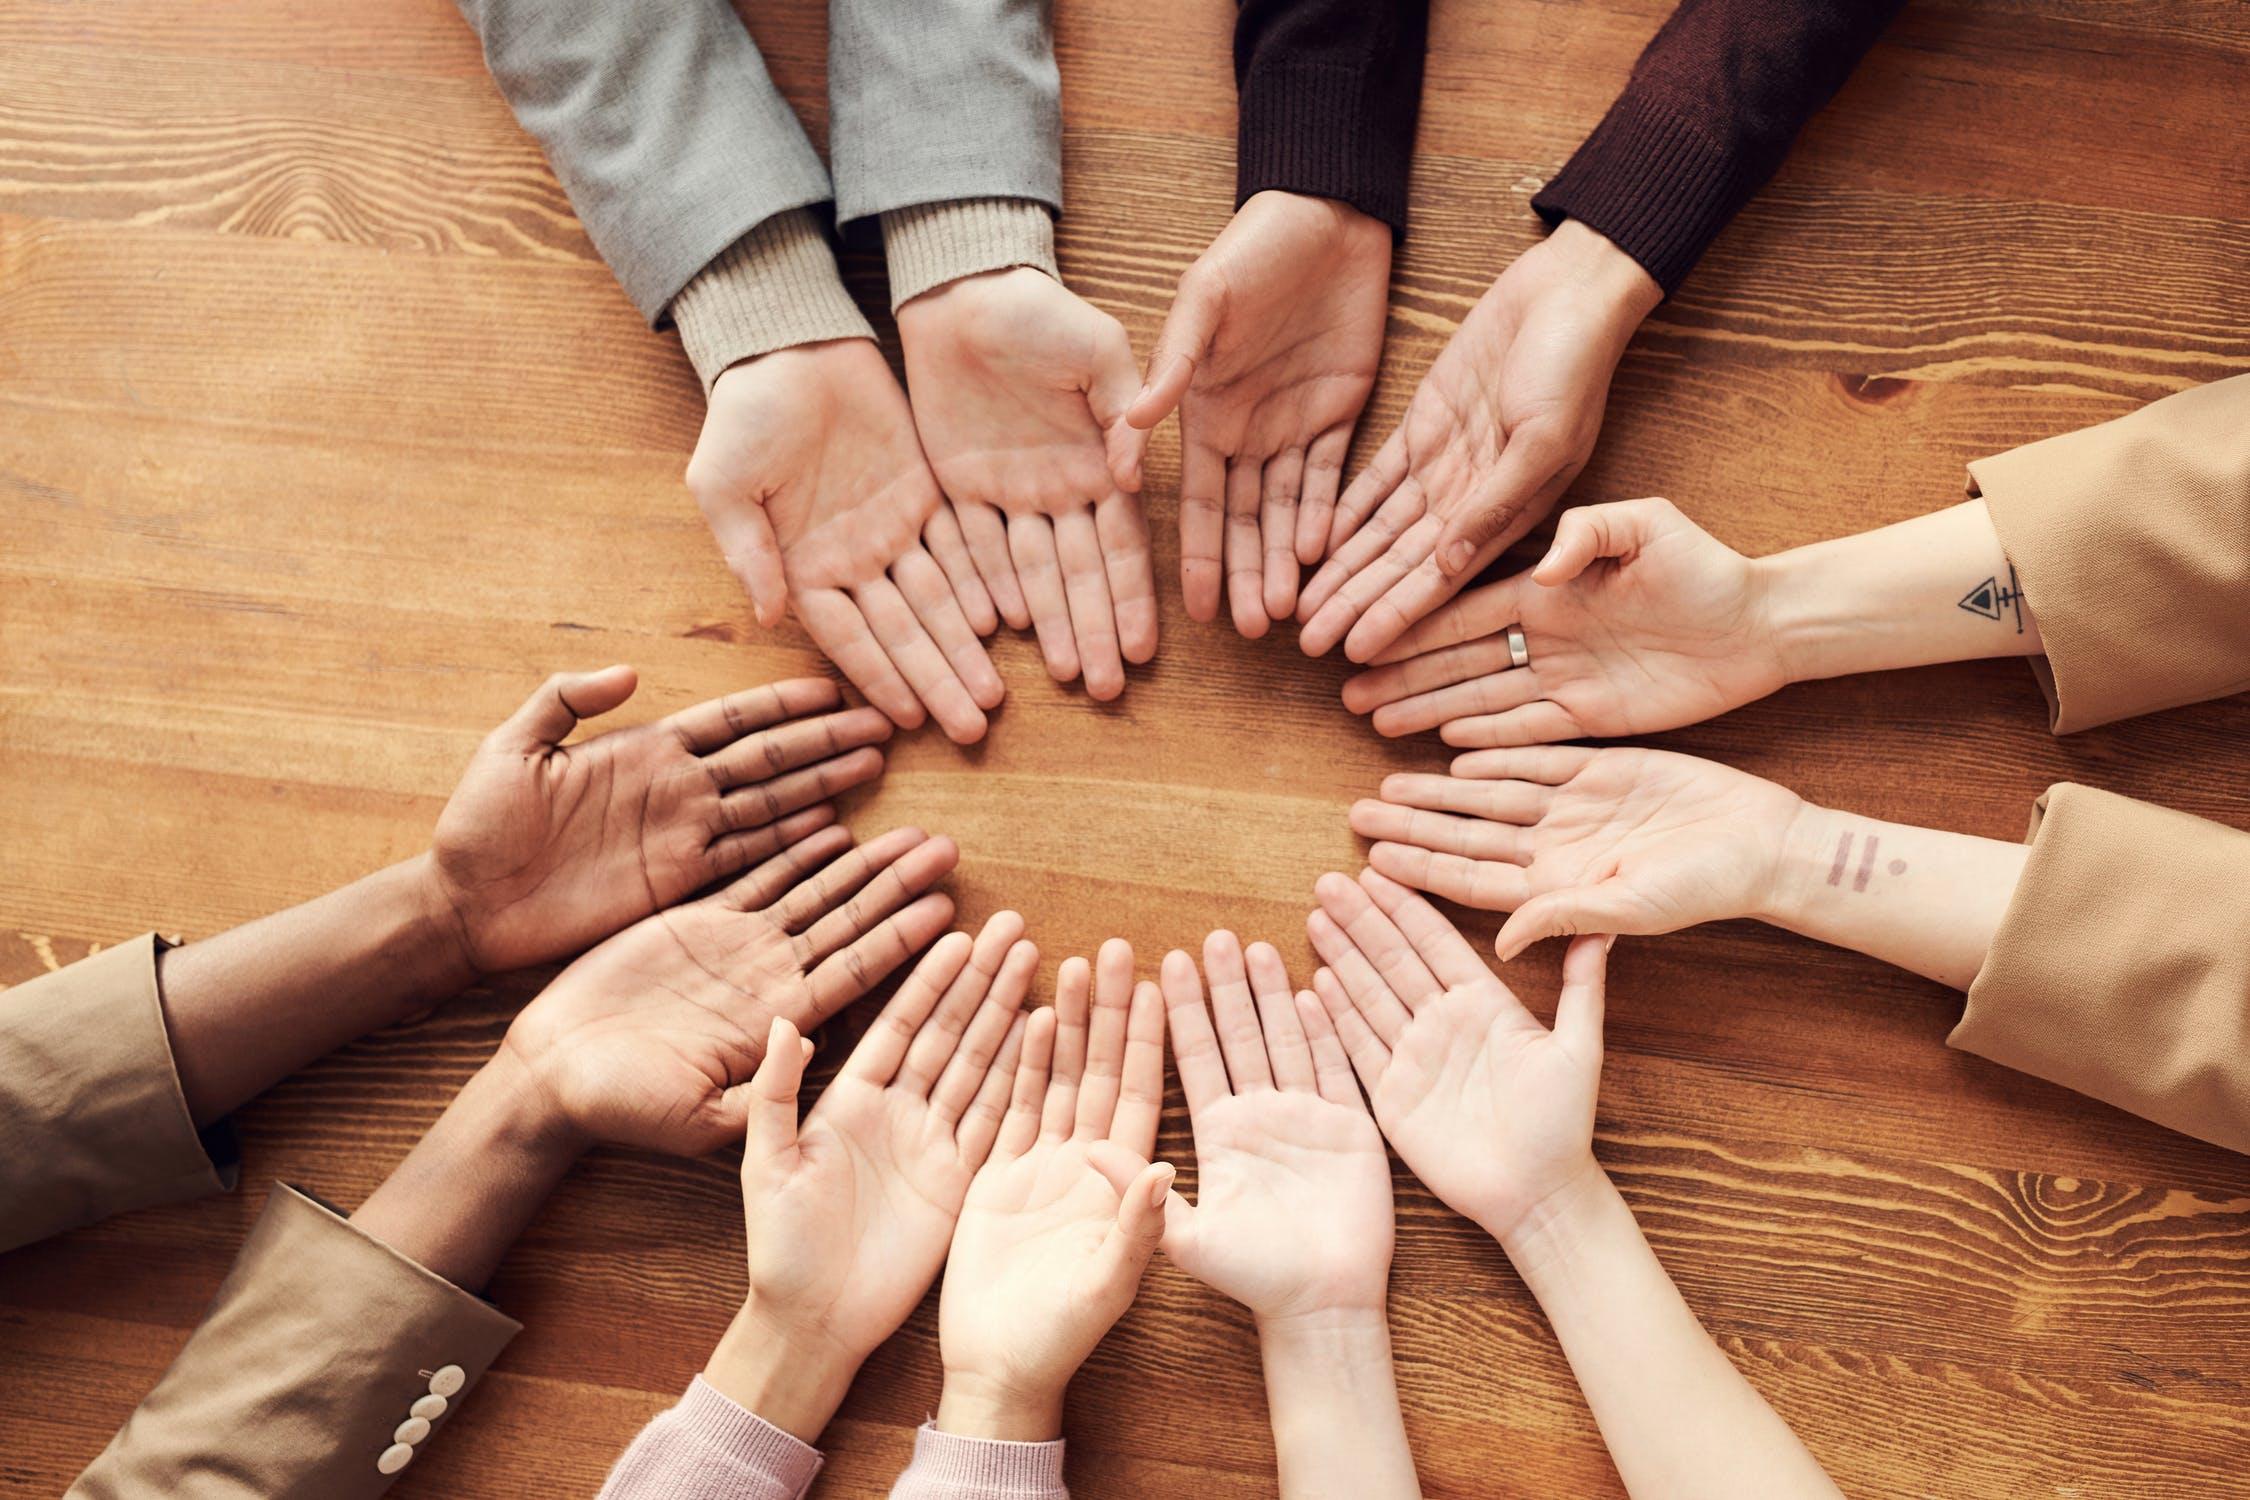 centre direct hand like a persuasive symbol